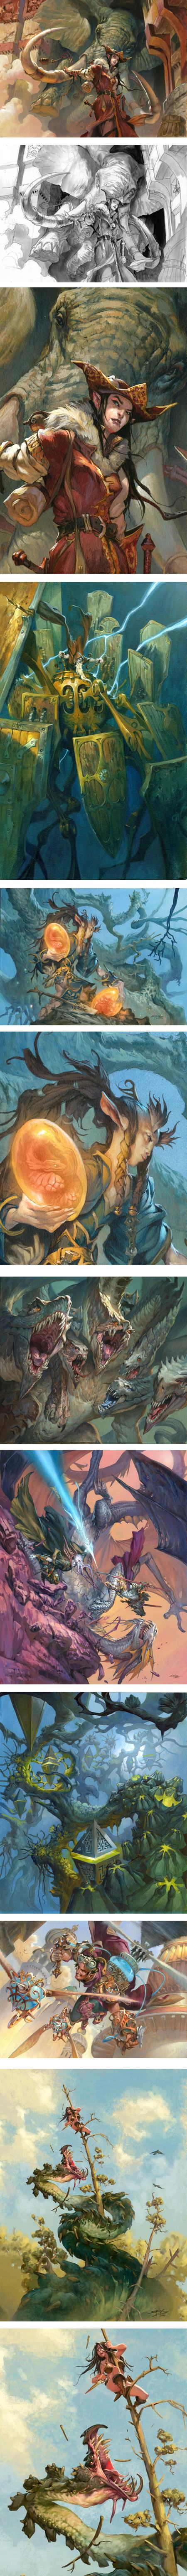 Jesper Ejsing, fantasy illustrations